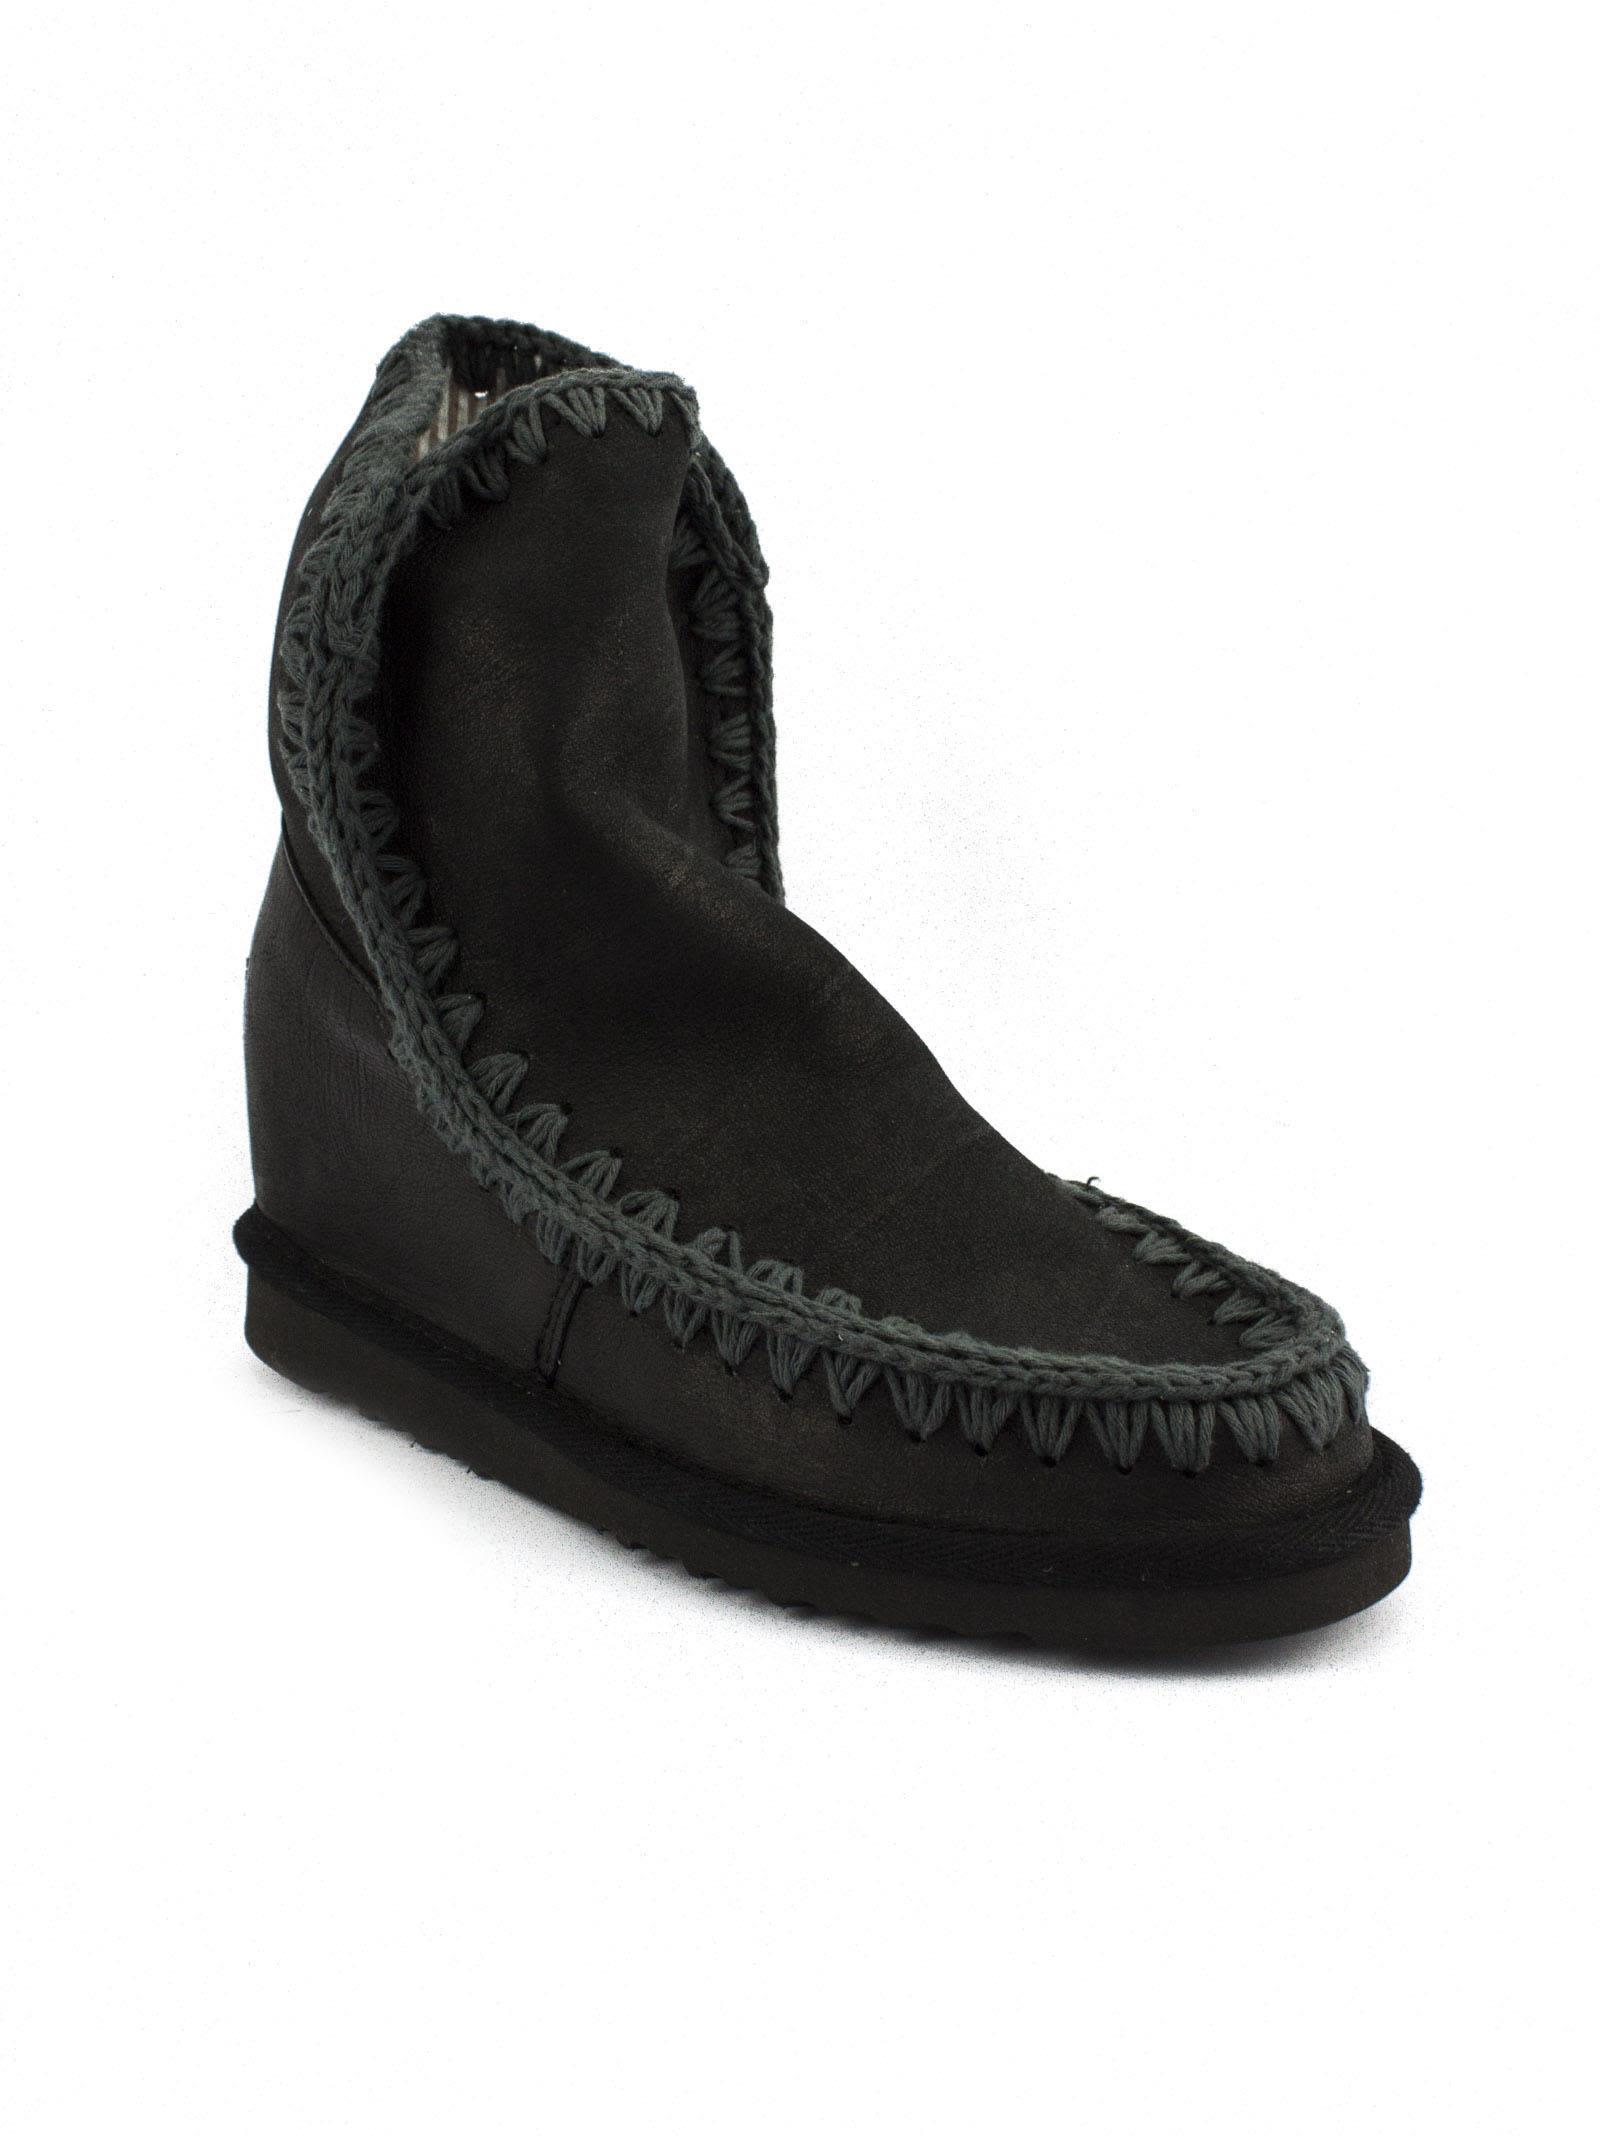 Mou Eskimo In Black Vintage Leather. Supply Get Authentic Sale Online Cheap Sale Enjoy NH4nbhkz